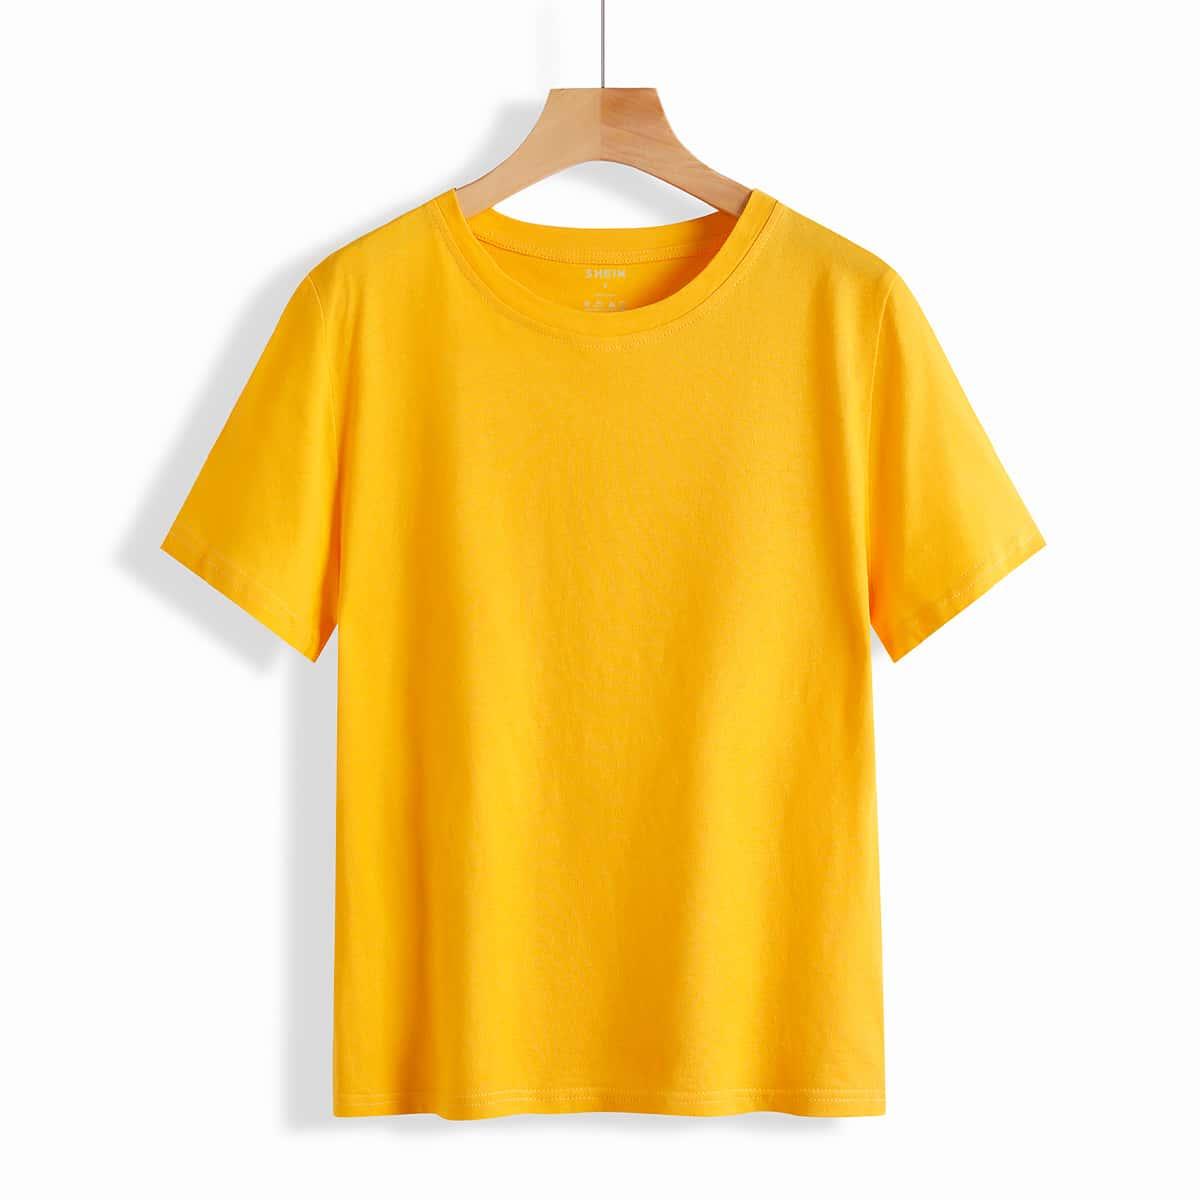 Однотонная футболка SheIn swtee24210525294